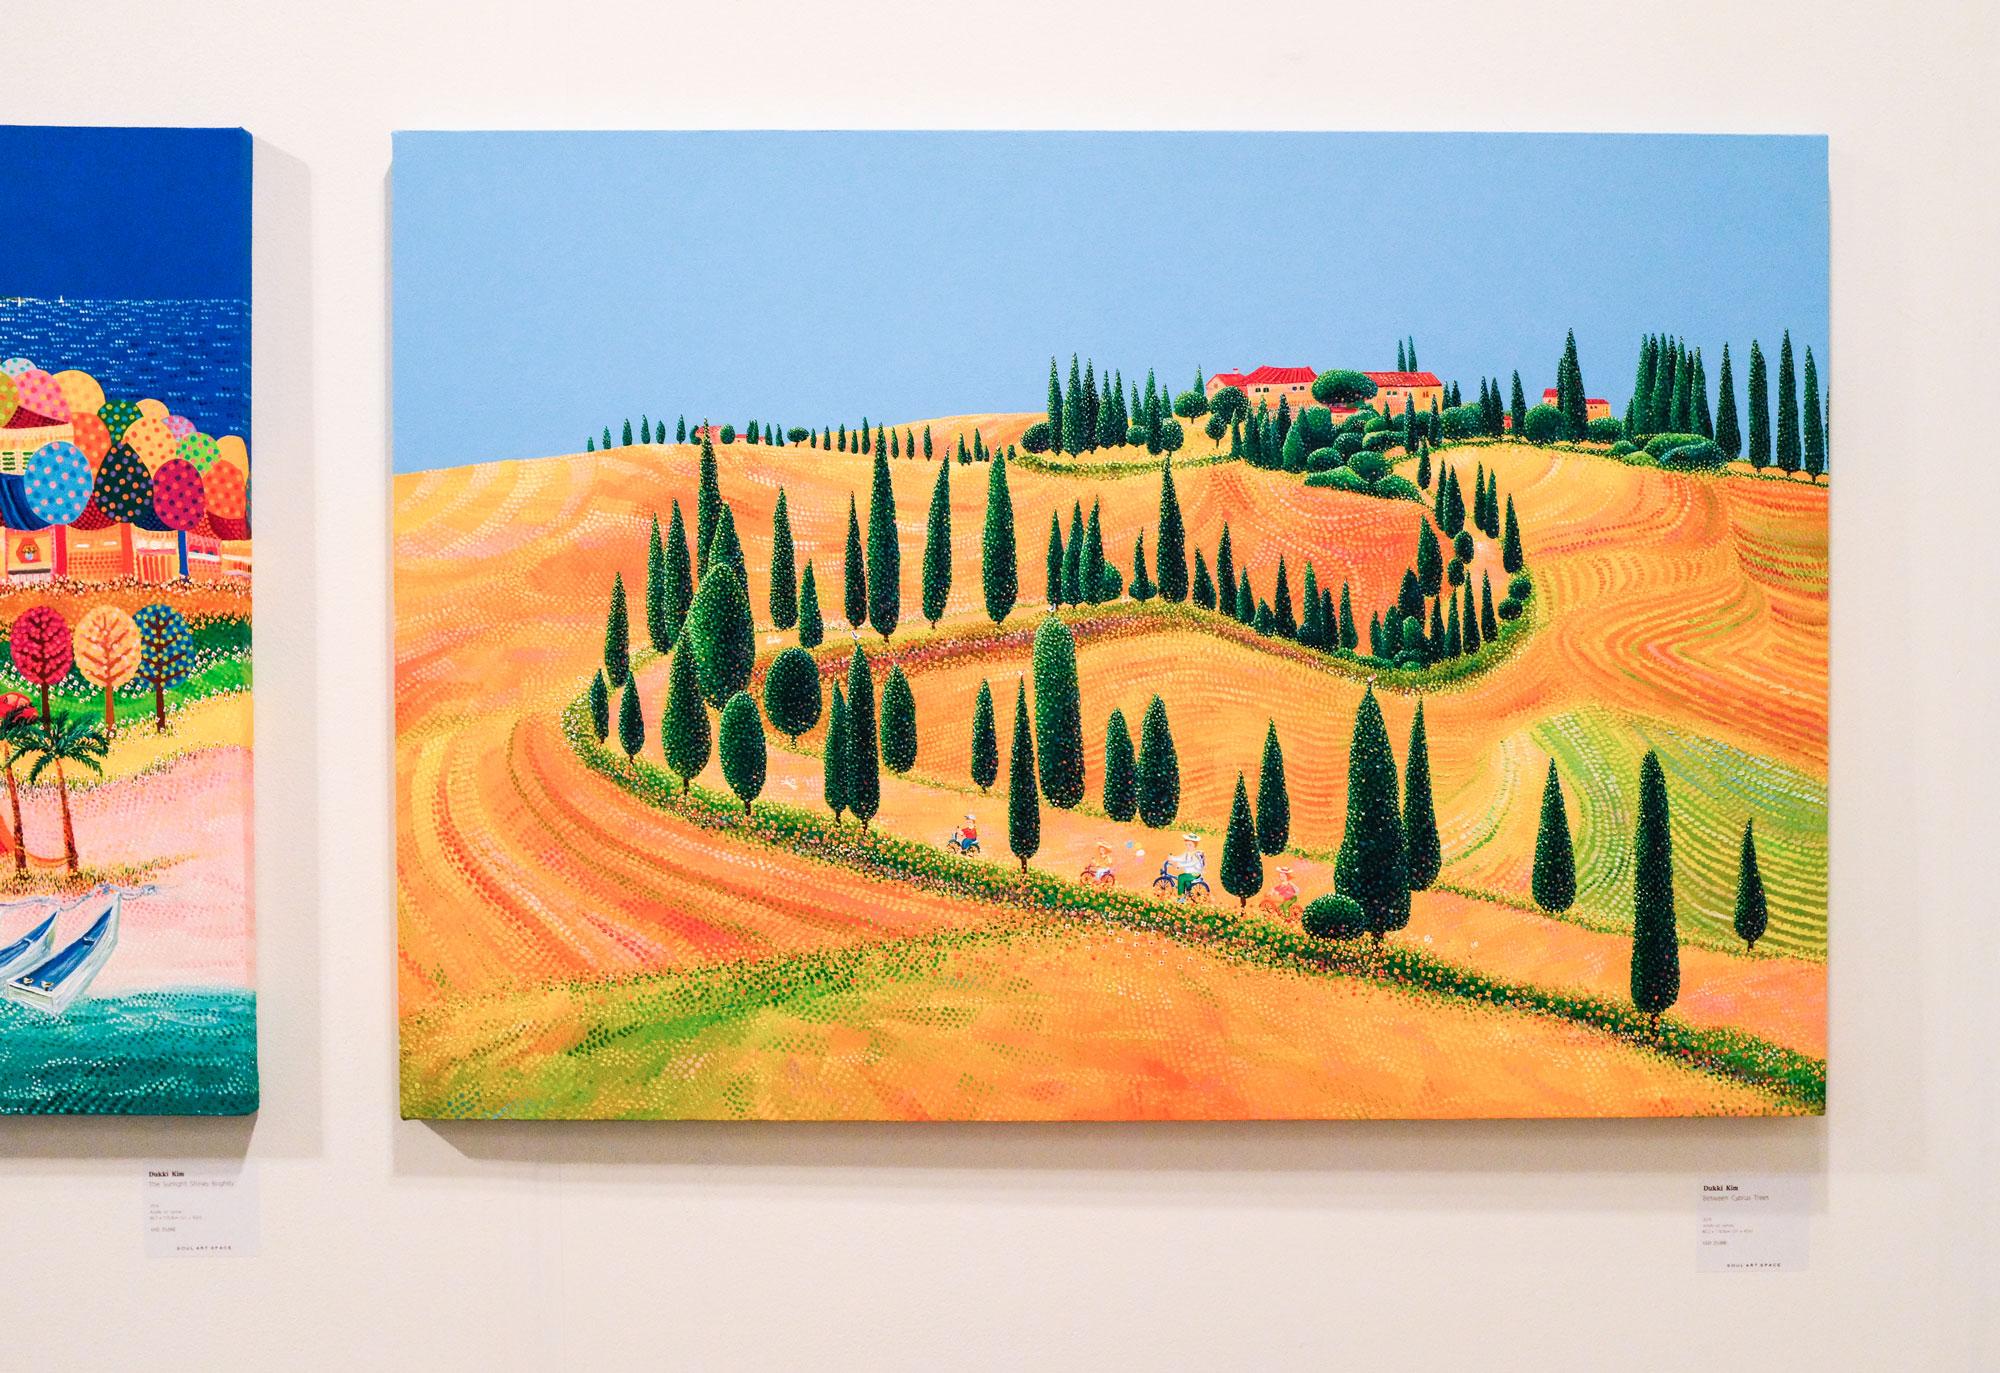 Dukki Kim, Between Cyprus Trees, 2018. Acrylic on canvas.